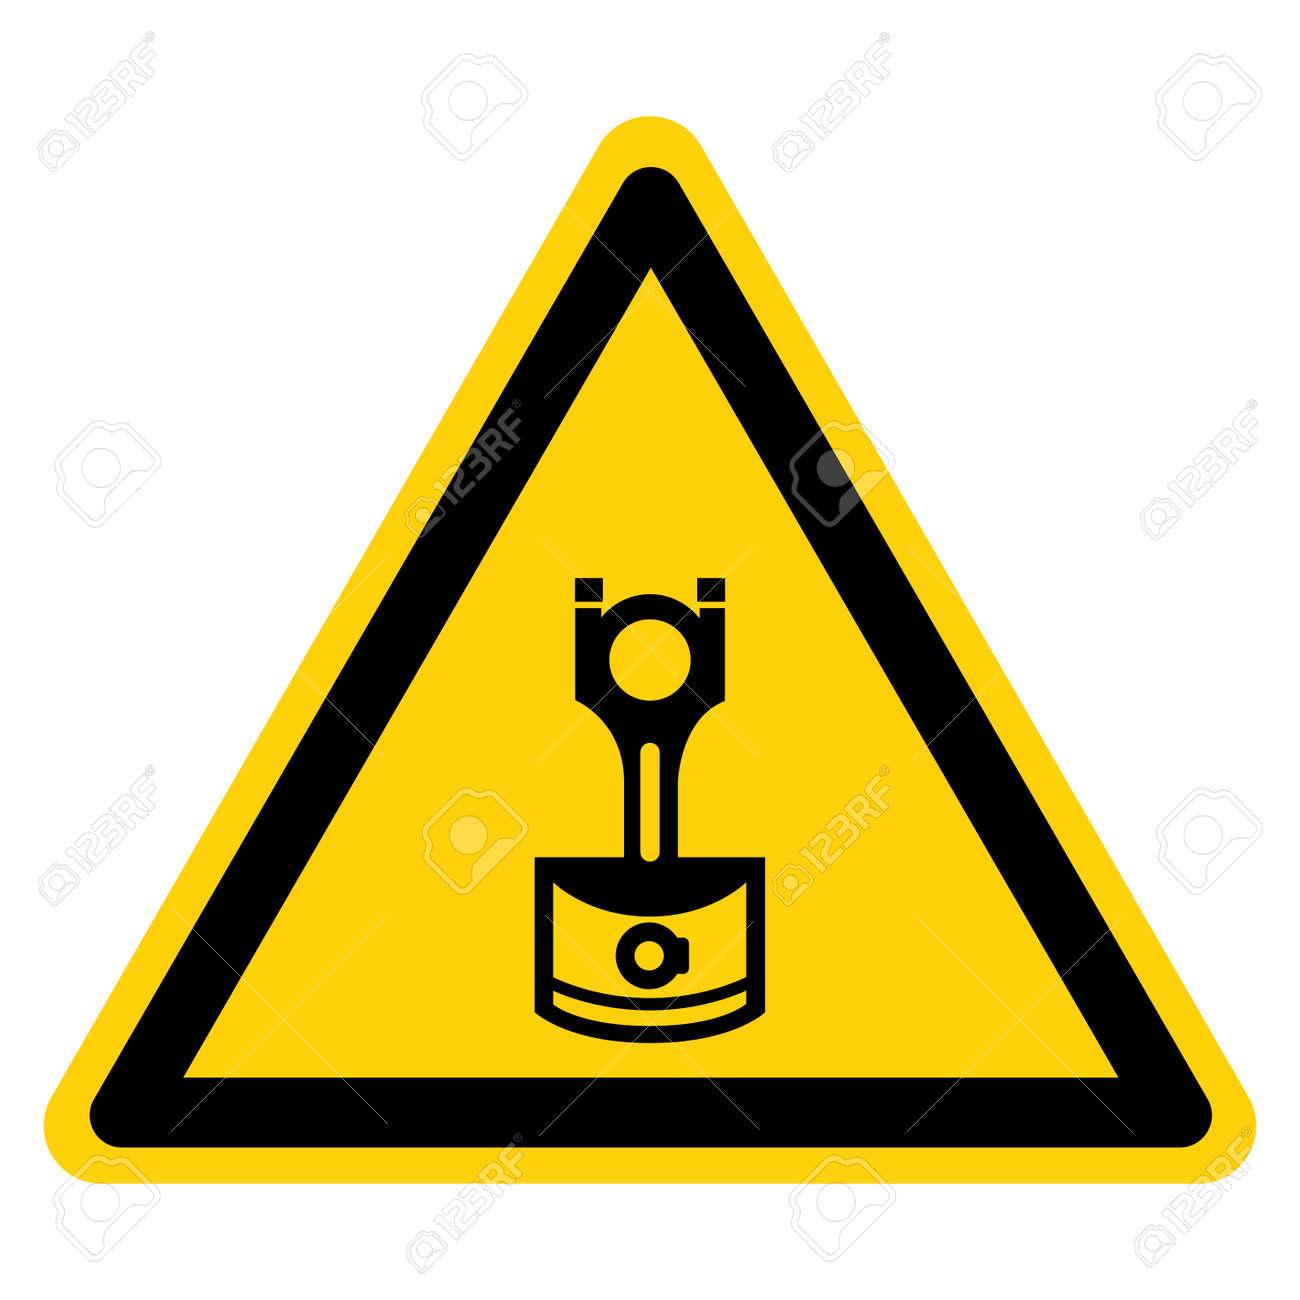 Machine Piston Symbol Sign, Vector Illustration, Isolate On White Background Label. EPS10 - 164155547